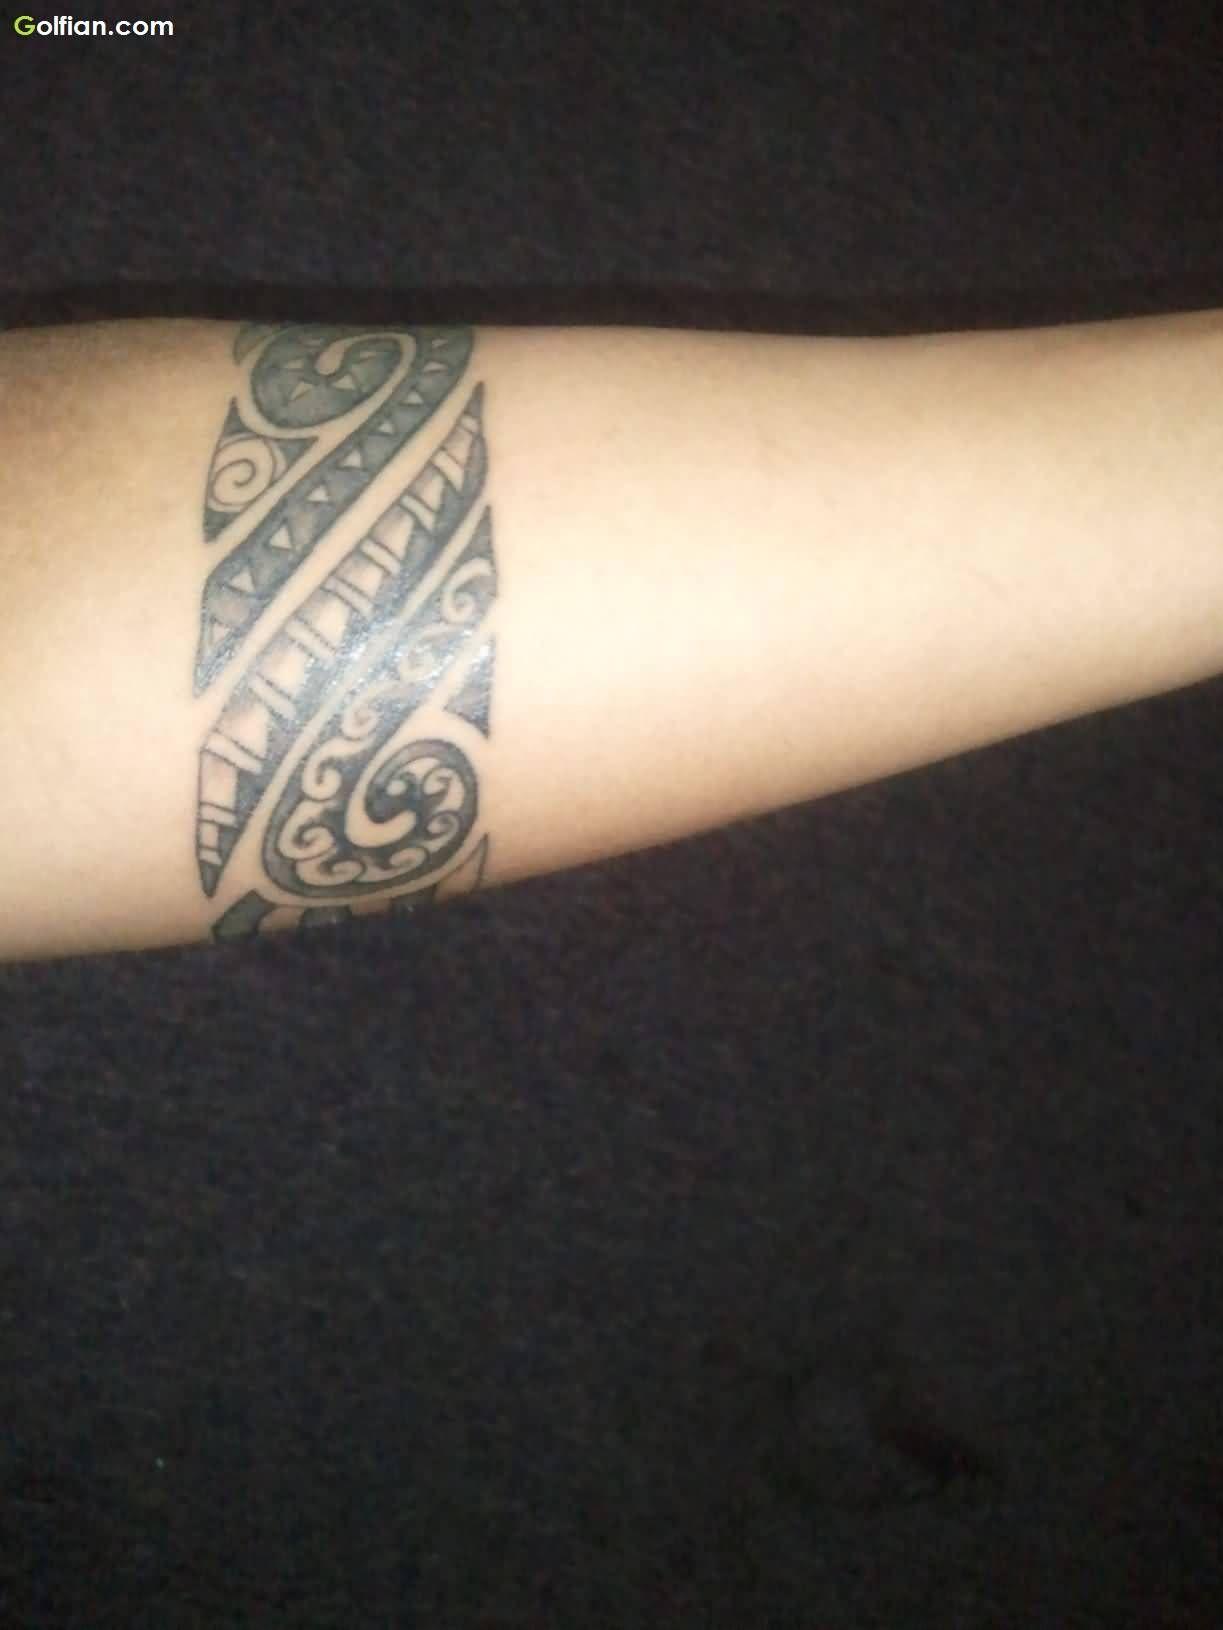 Cool Tribal Maori Armband Tattoo On Lower Arm 12231630 with regard to measurements 1223 X 1630